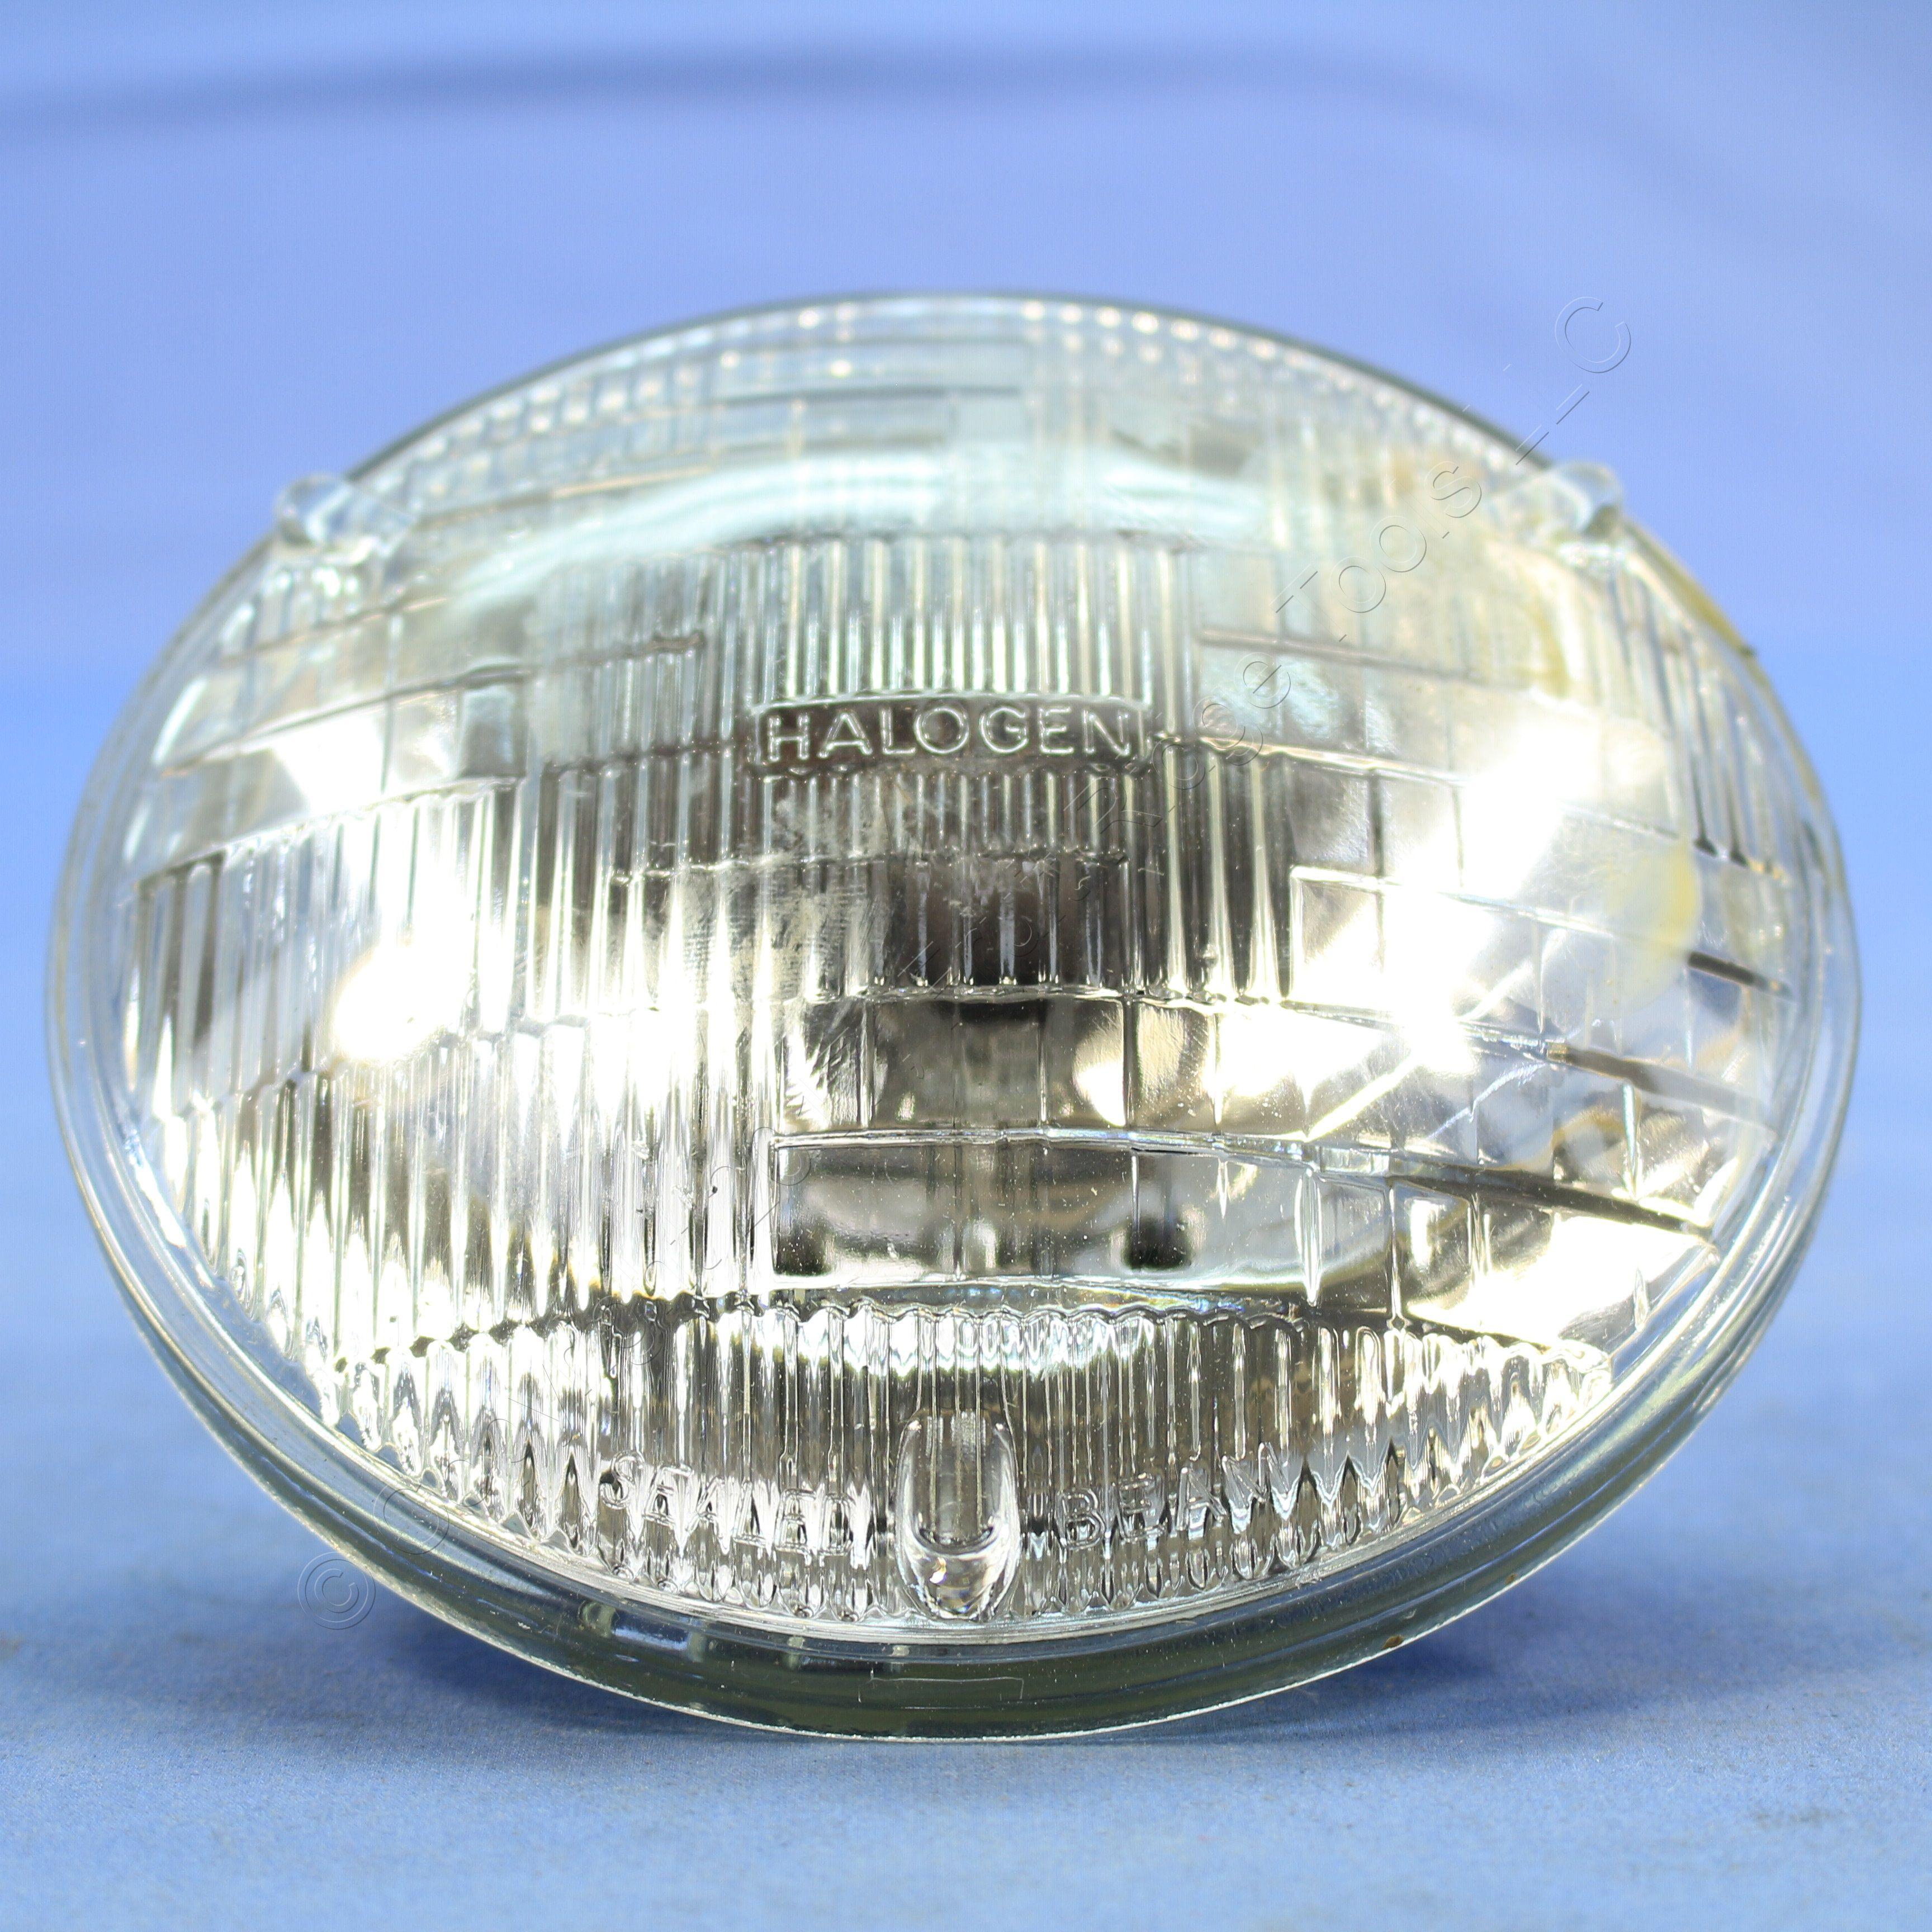 NEW PHILIPS H5006 Round Halogen Headlamp C-6 12V 35W High/Low Beam on